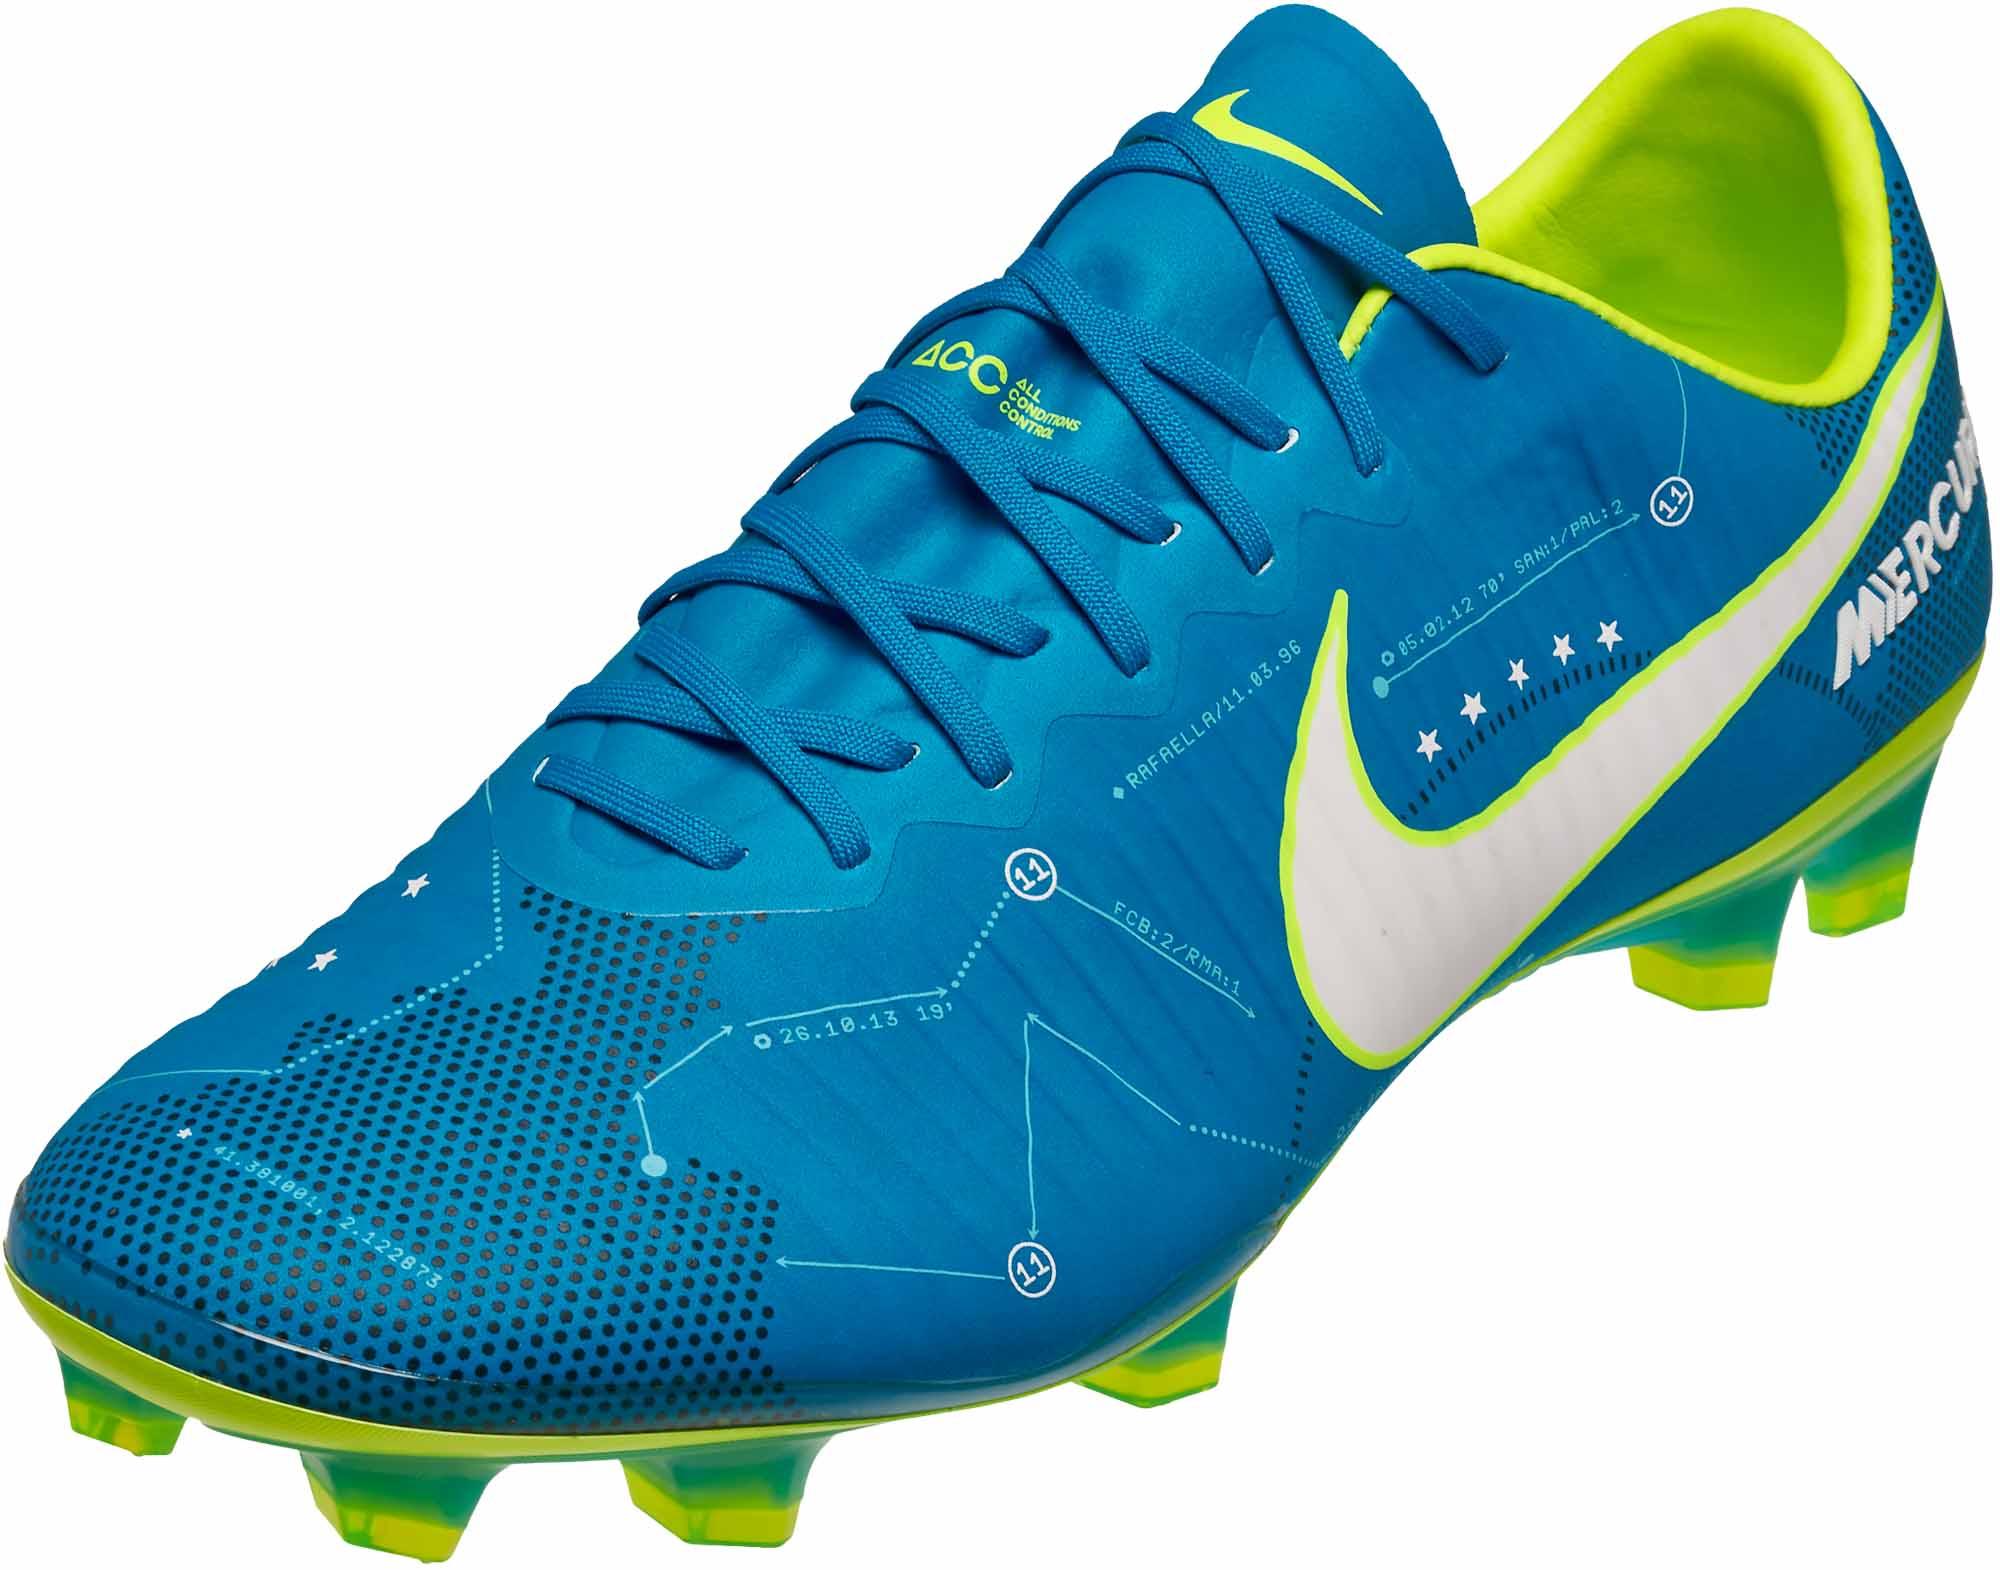 Nike Mercurial Vapor XI FG - Neymar Soccer Cleats